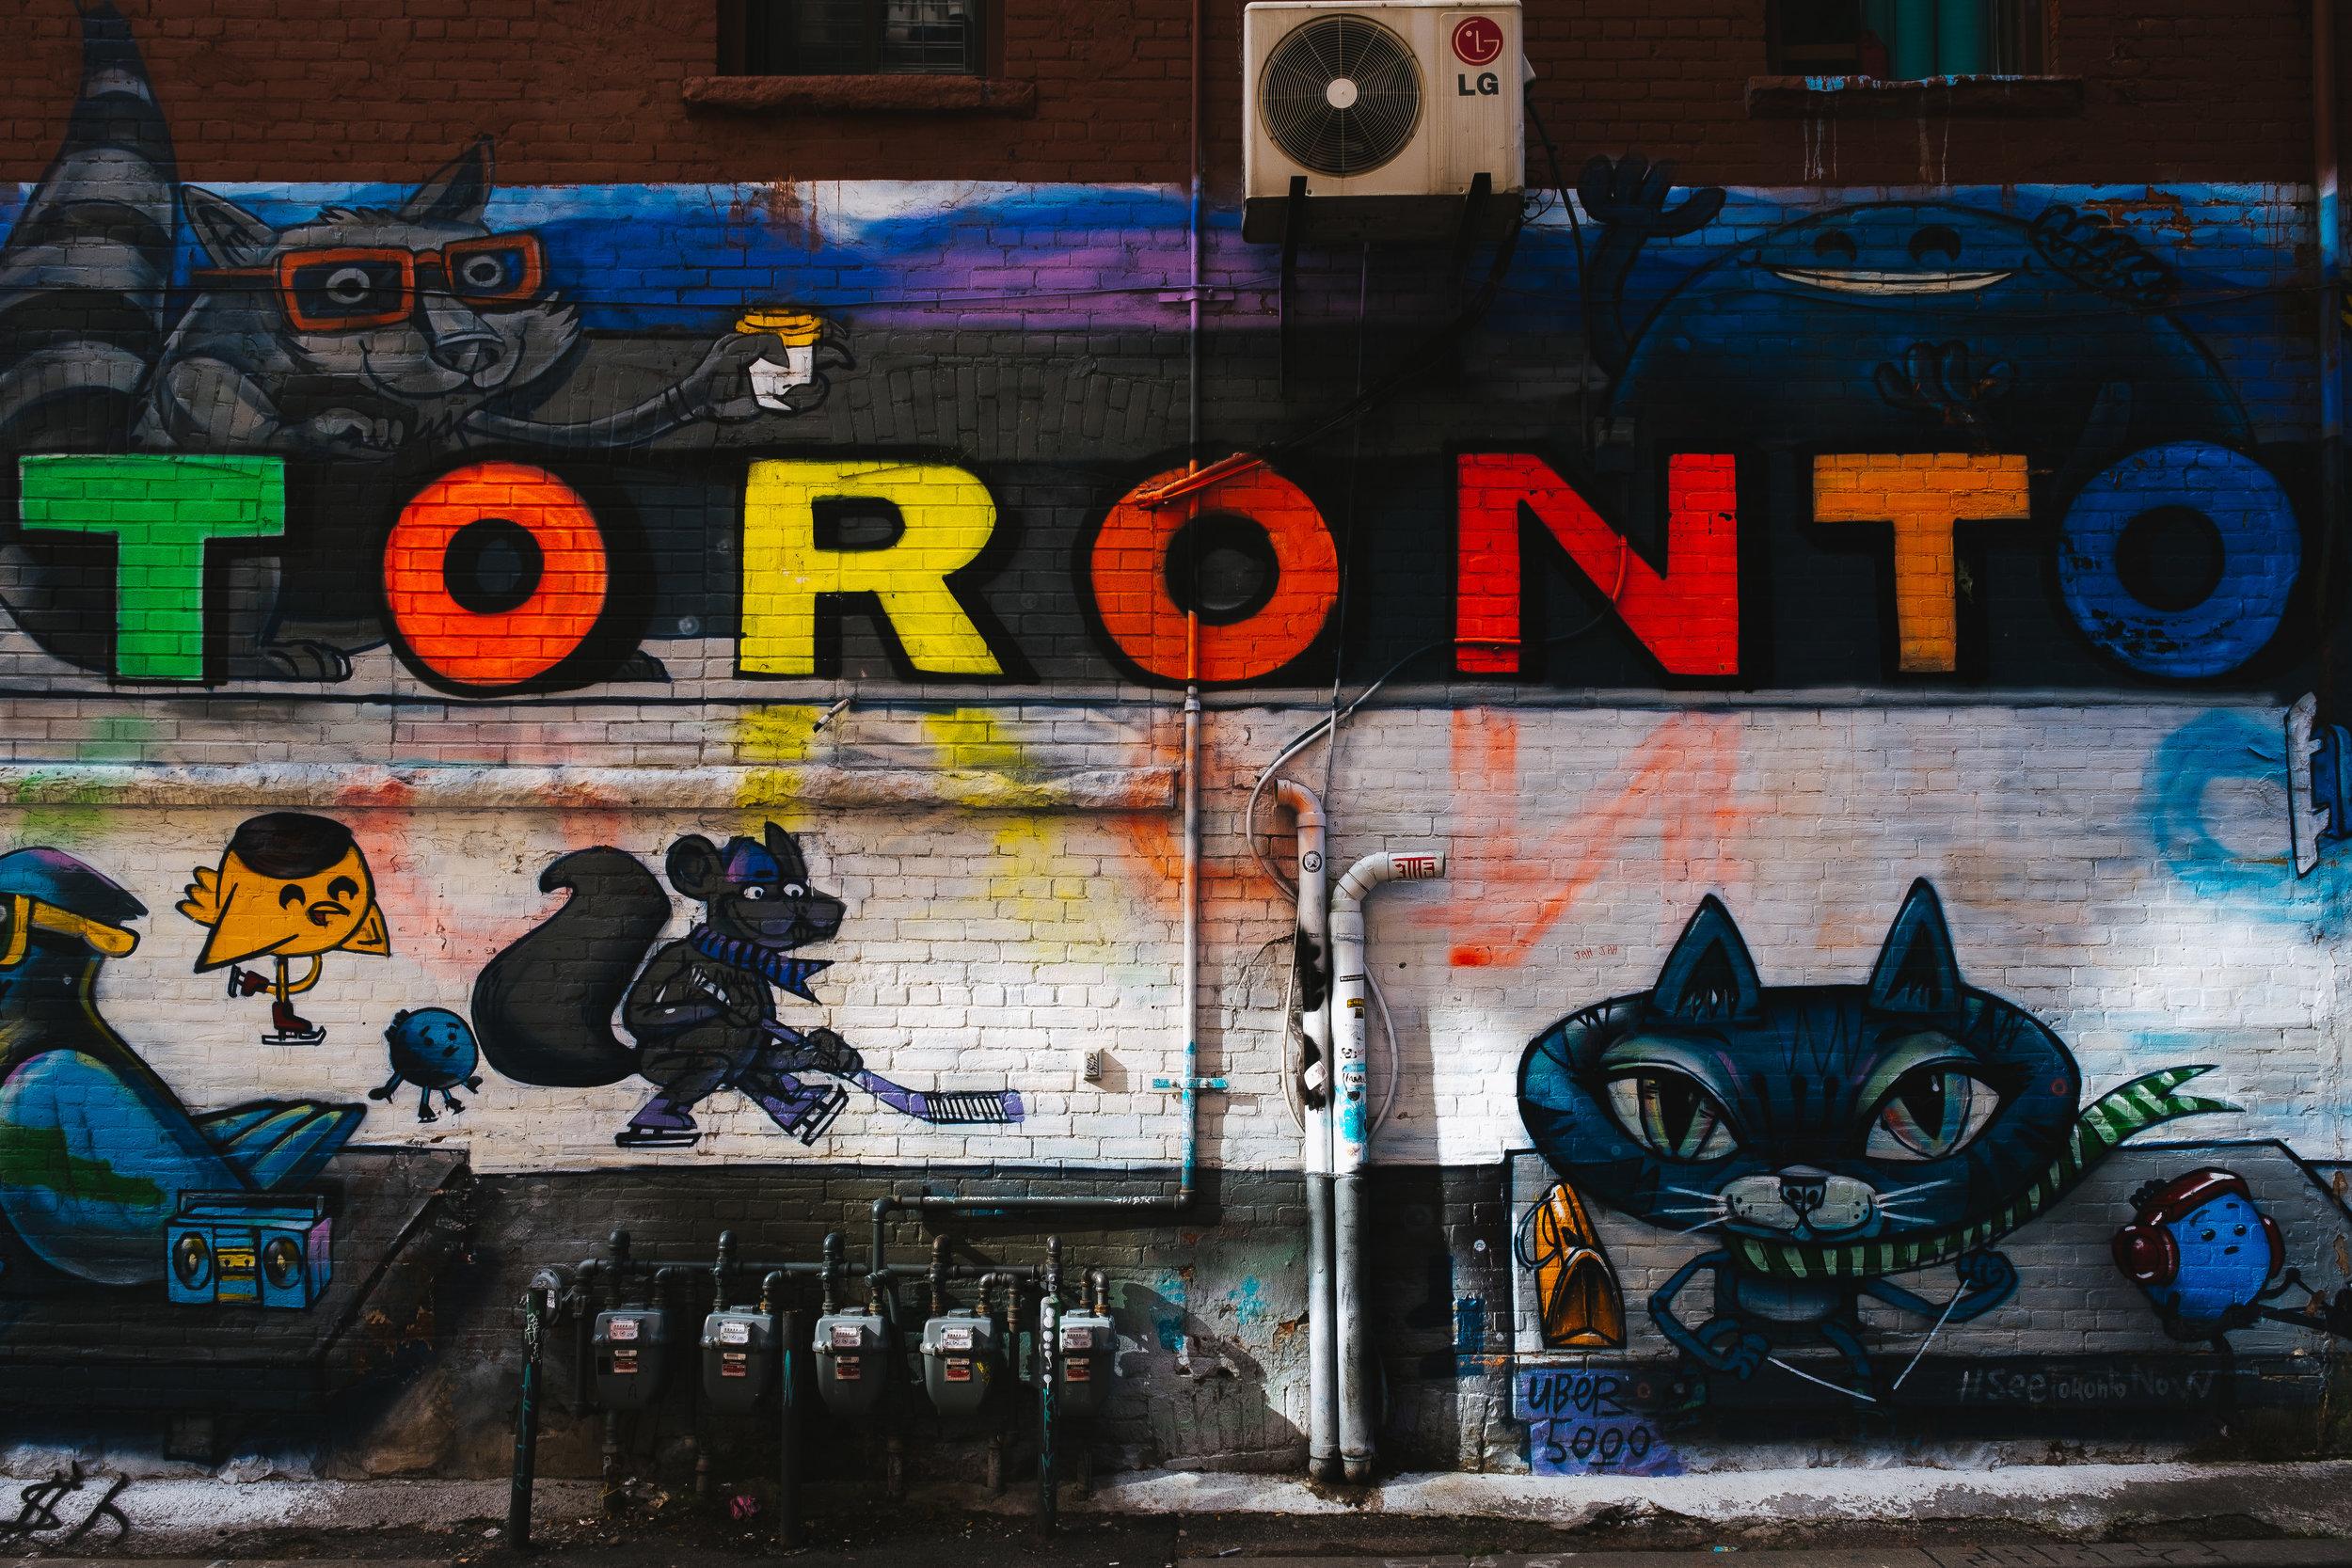 Toronto Graffiti Alley.jpg